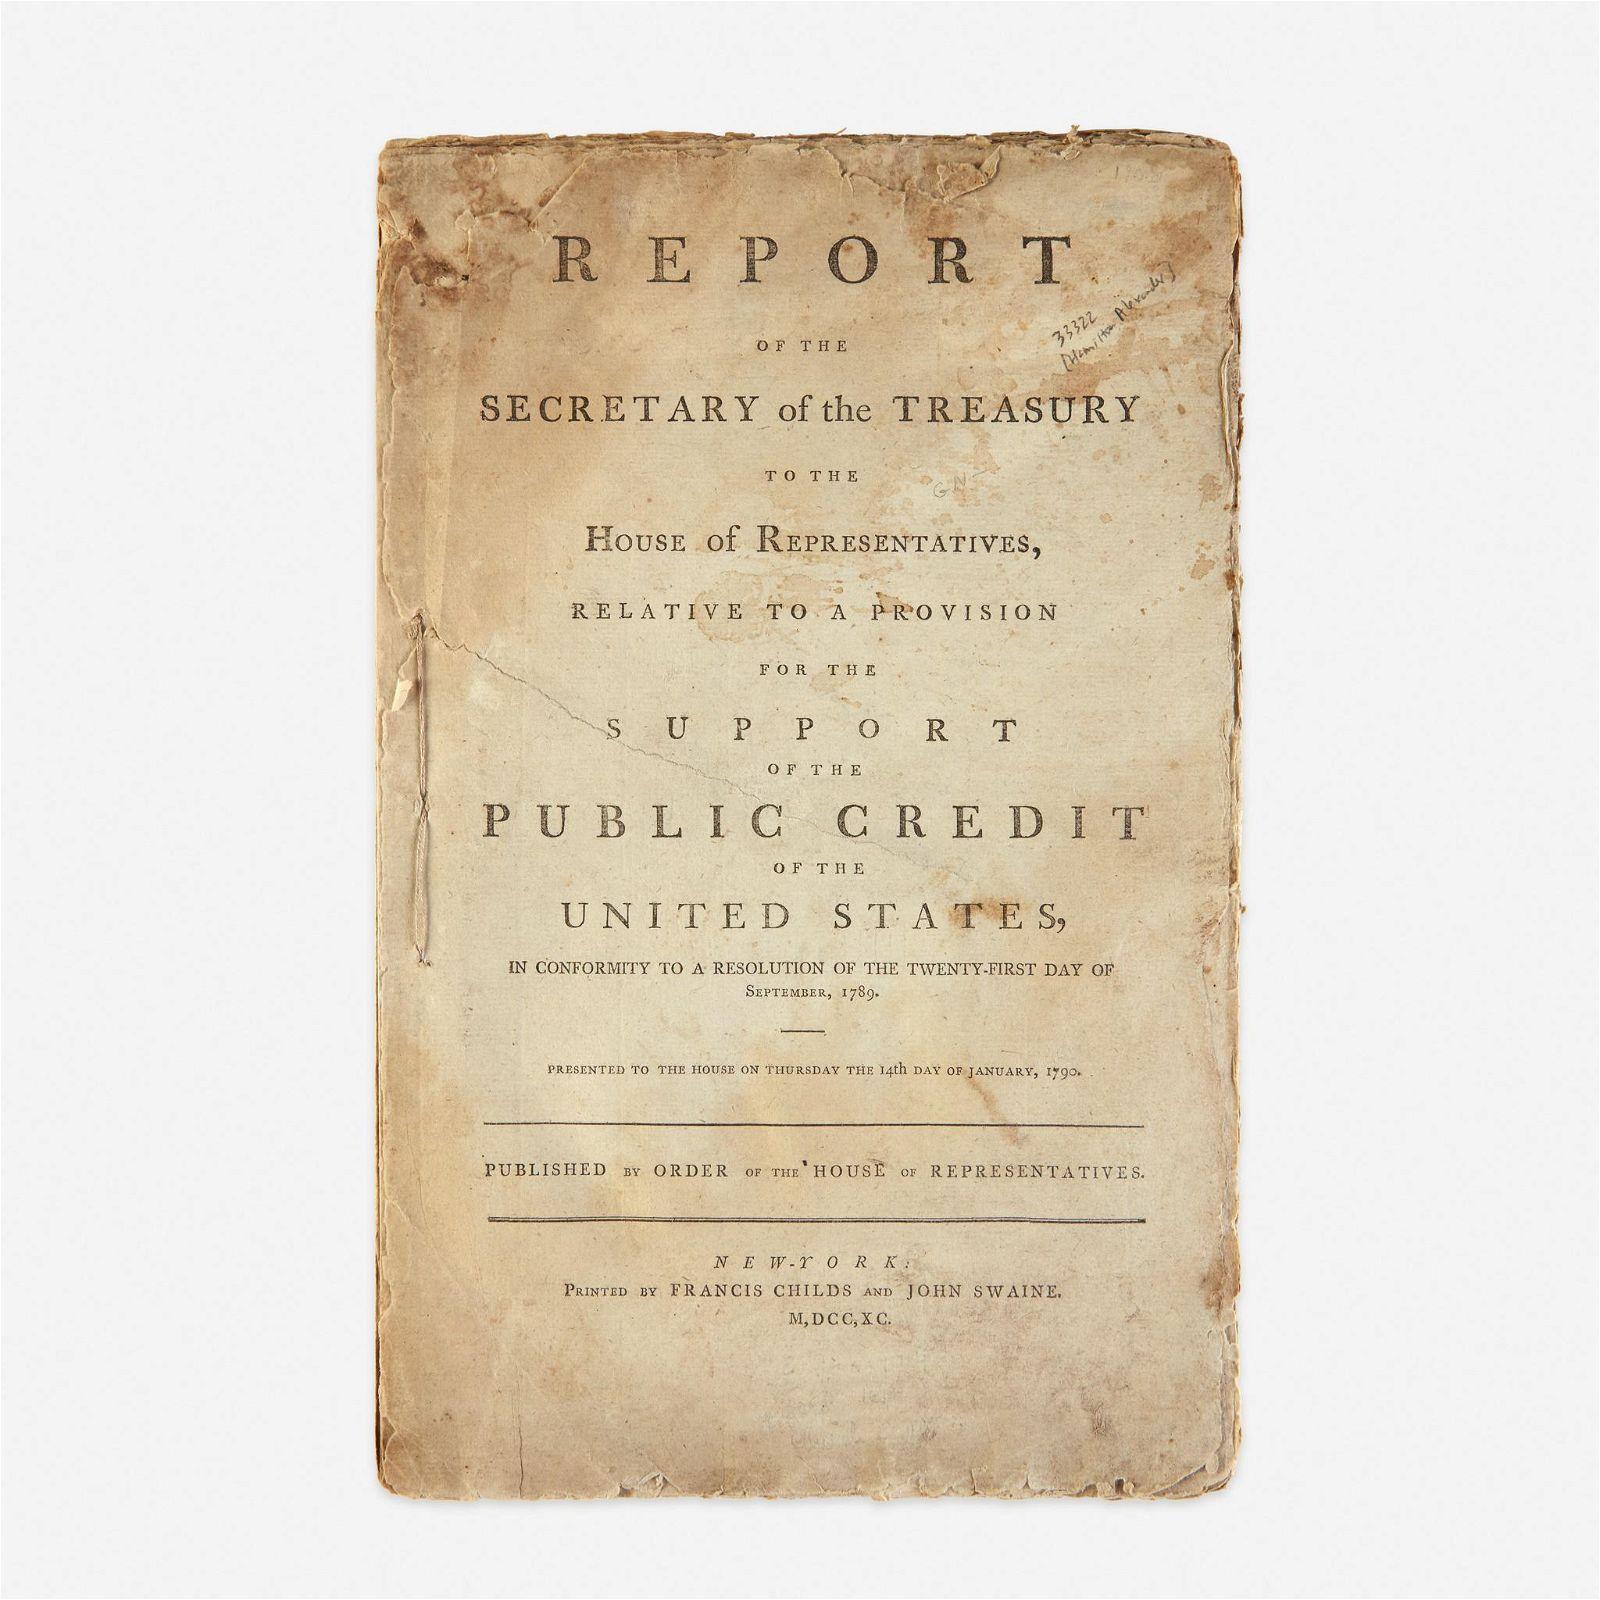 [Hamilton, Alexander] [Public Credit] Report of the